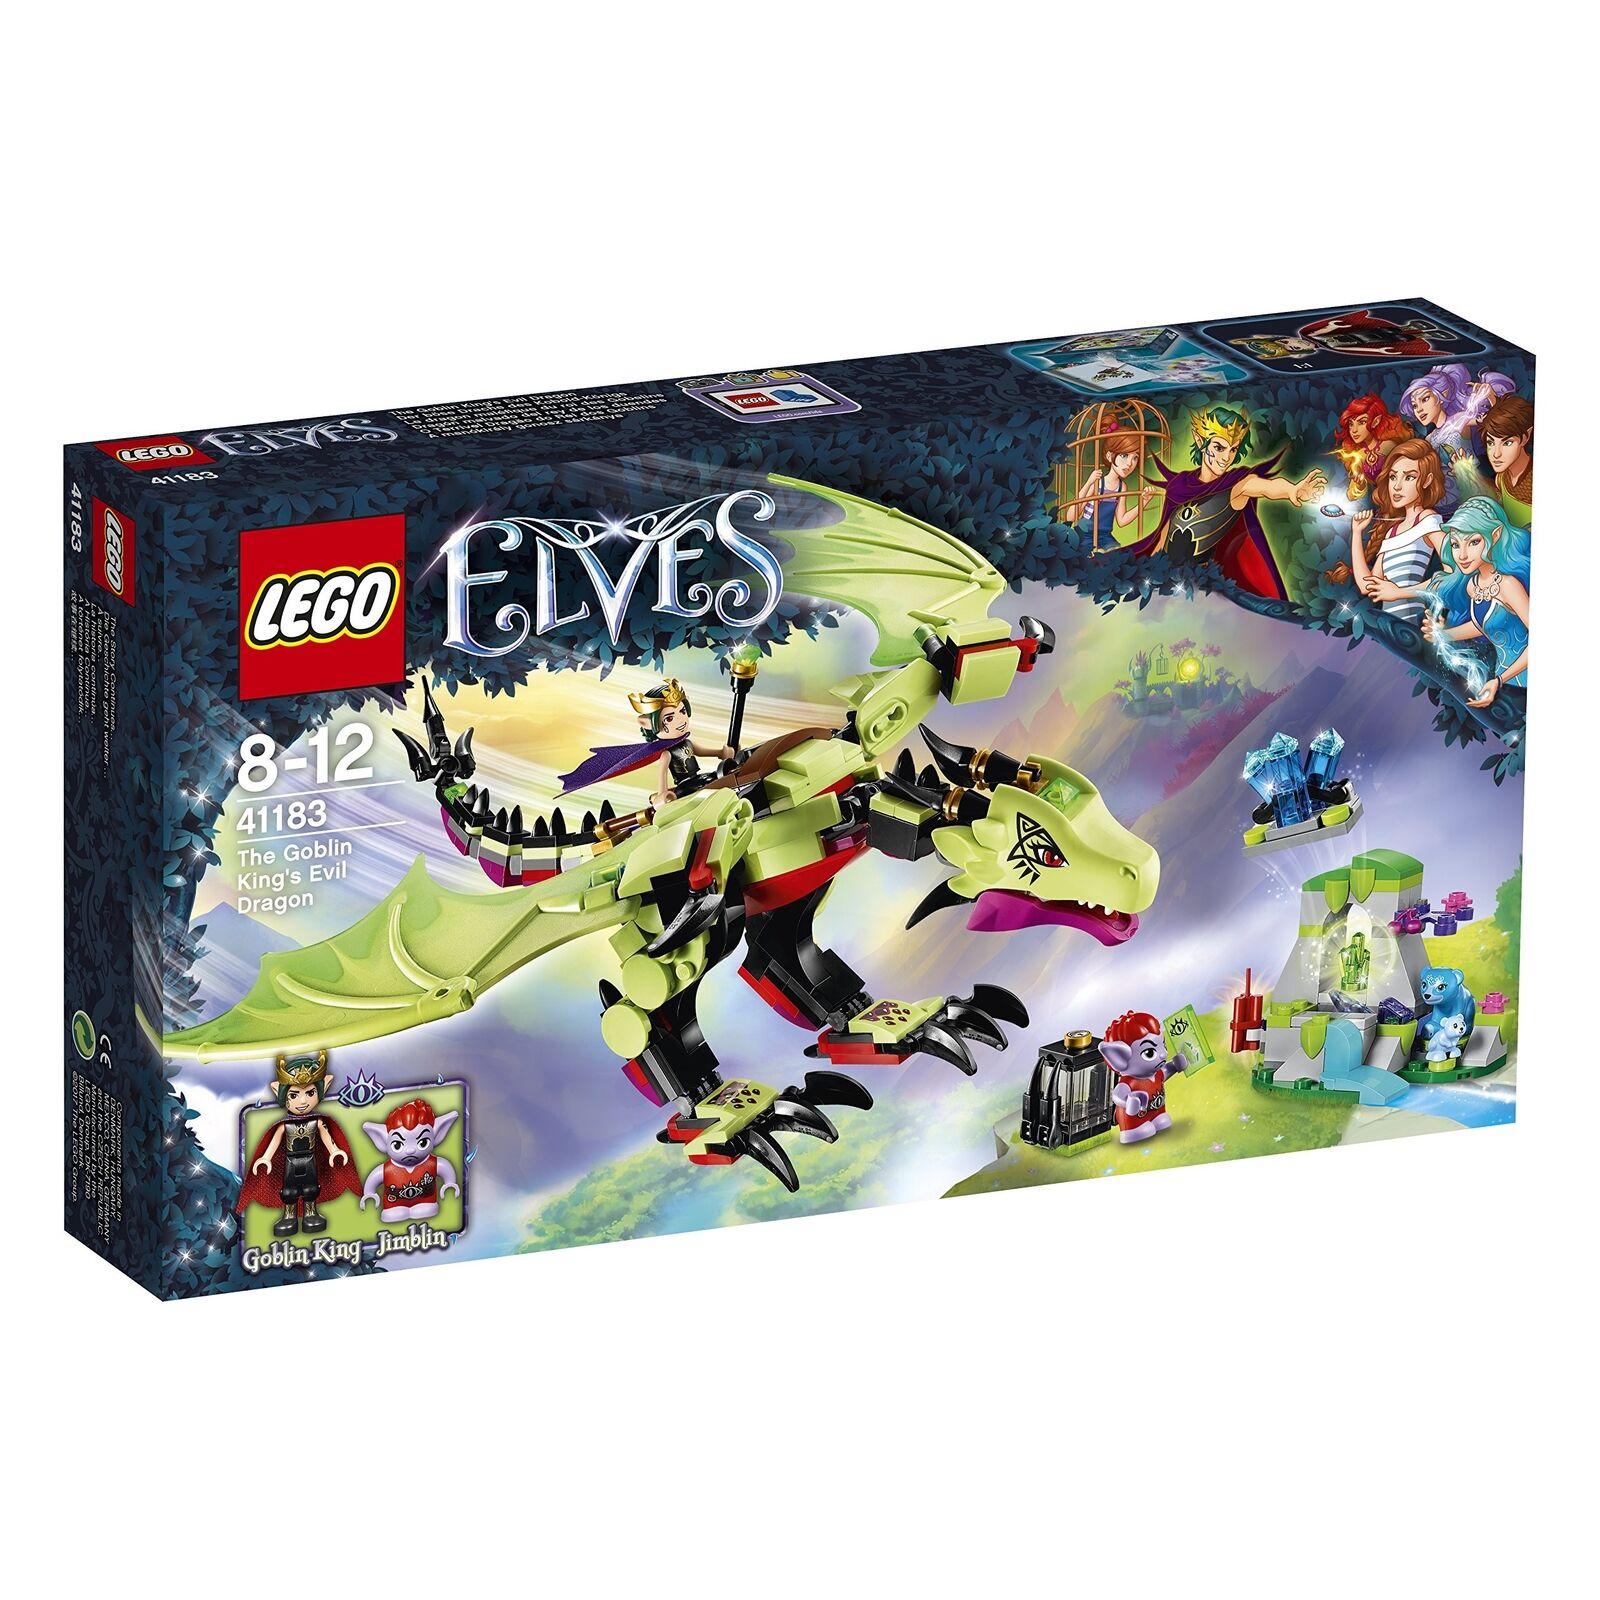 LEGO 41183 The Goblin King's Evil Dragon